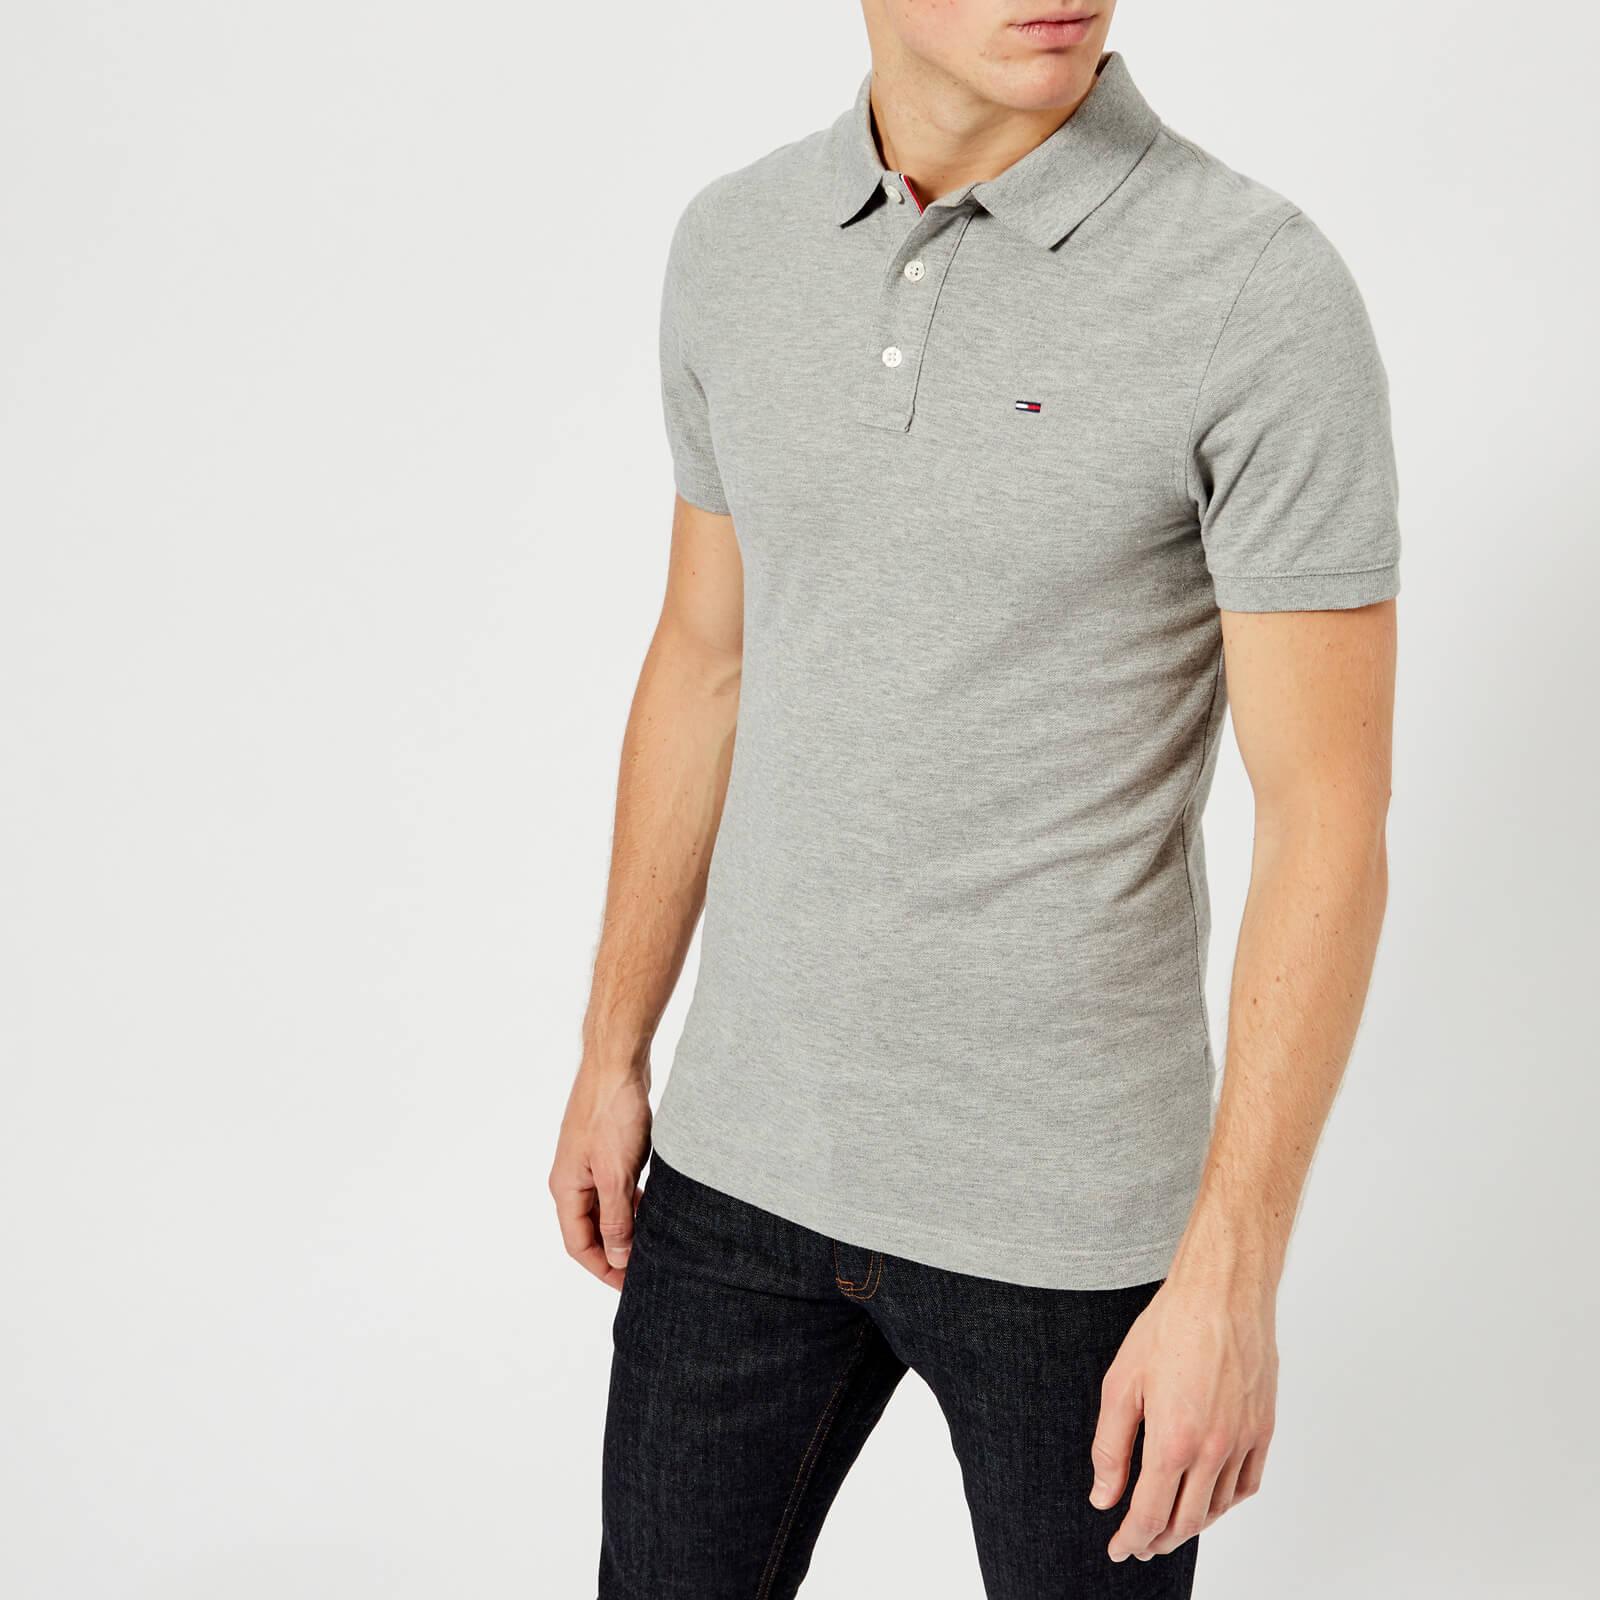 ab8a7460 Tommy Jeans Men's Original Fine Pique Polo Shirt - Light Grey Heather  Clothing   TheHut.com